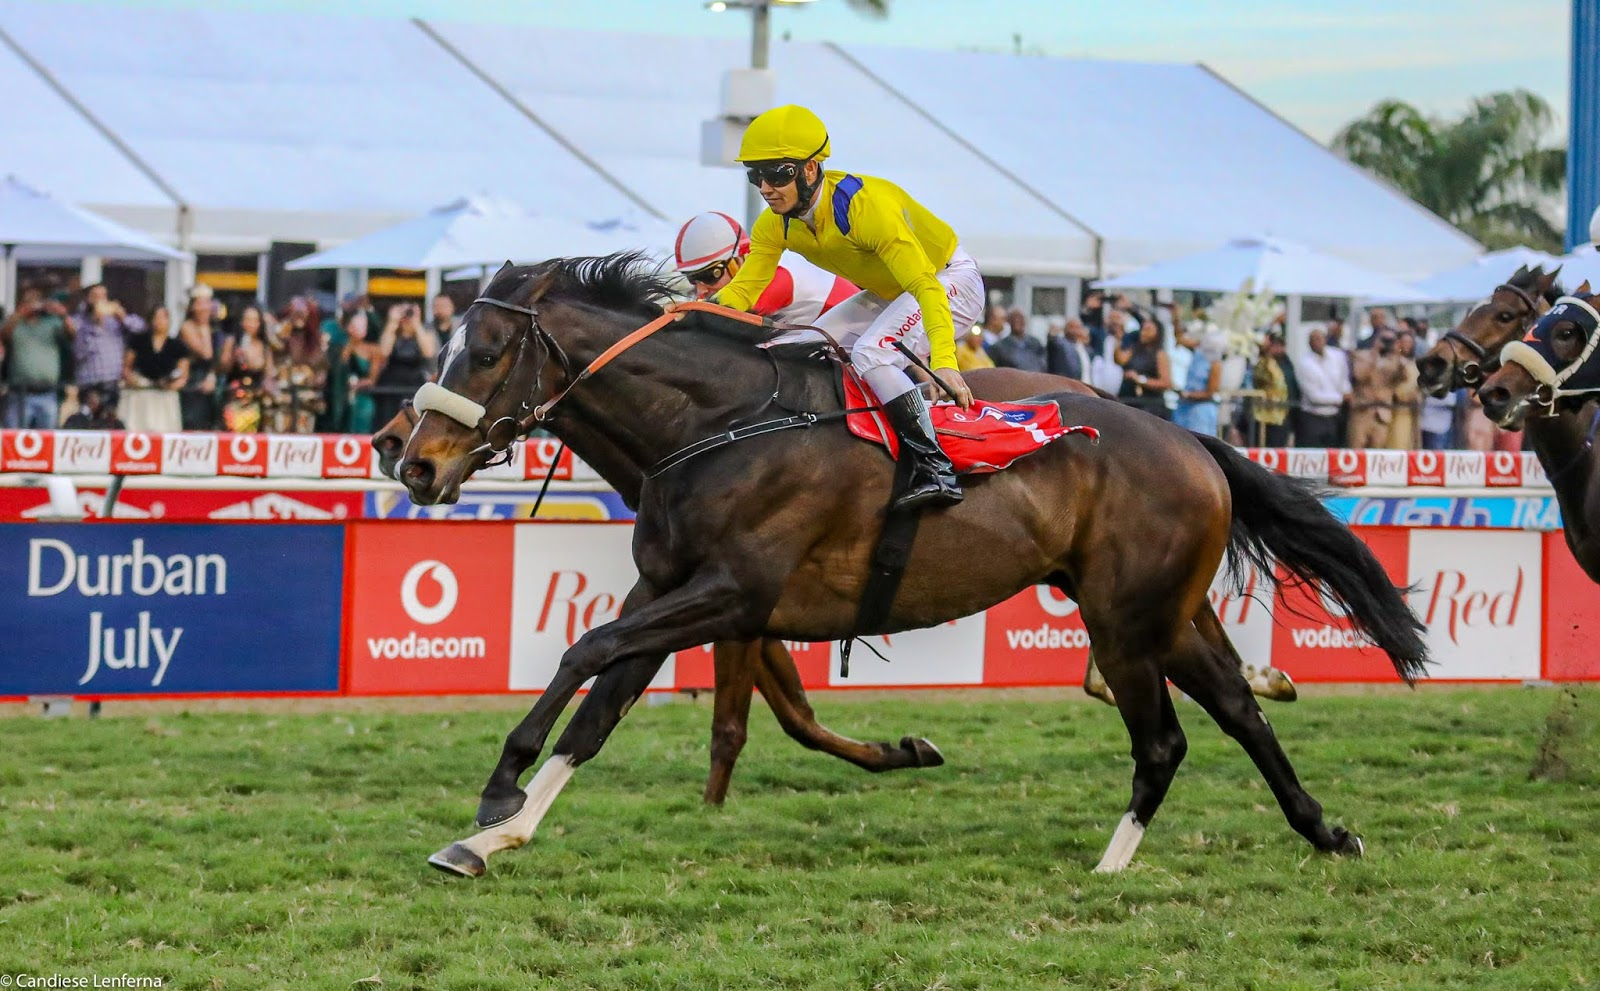 Vodacom Durban July 2020 Horse Profile - Do It Again